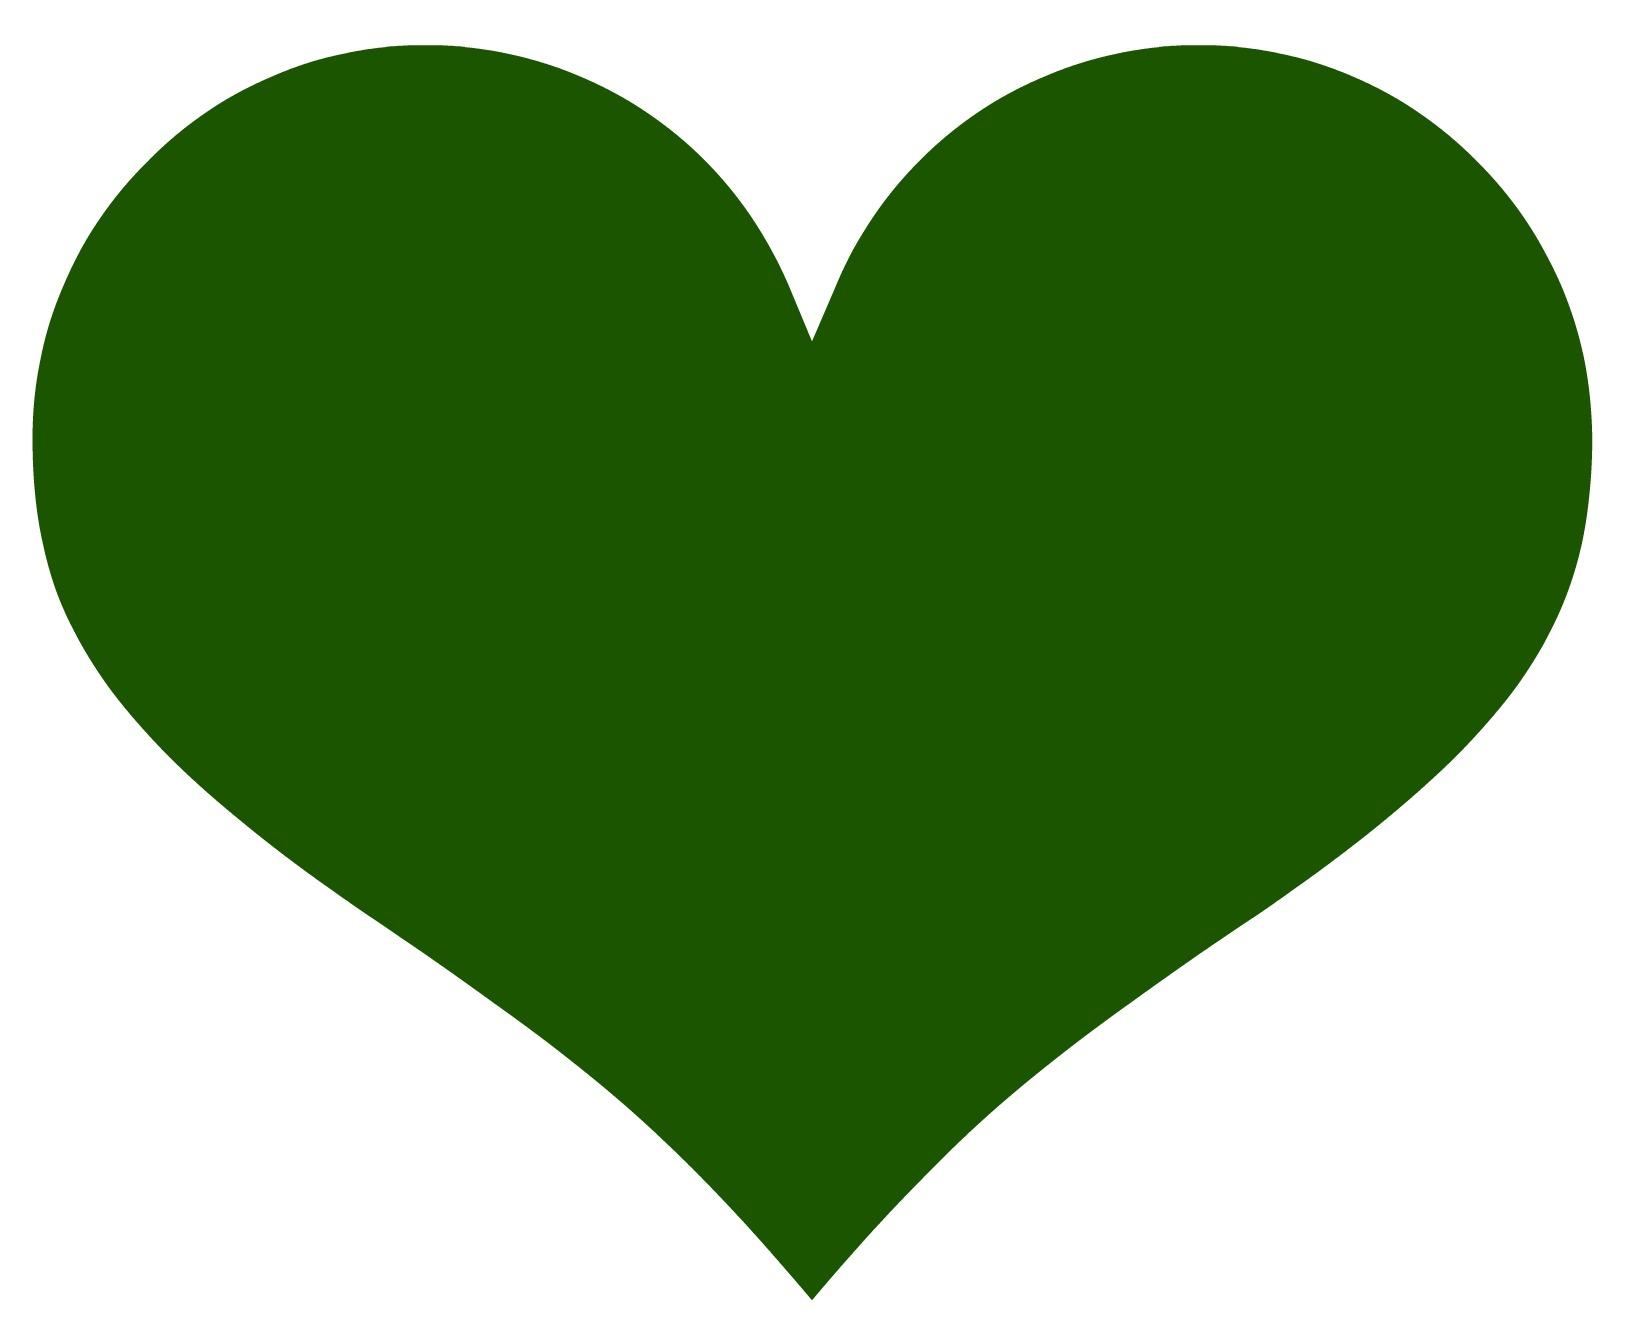 Green Heart Image